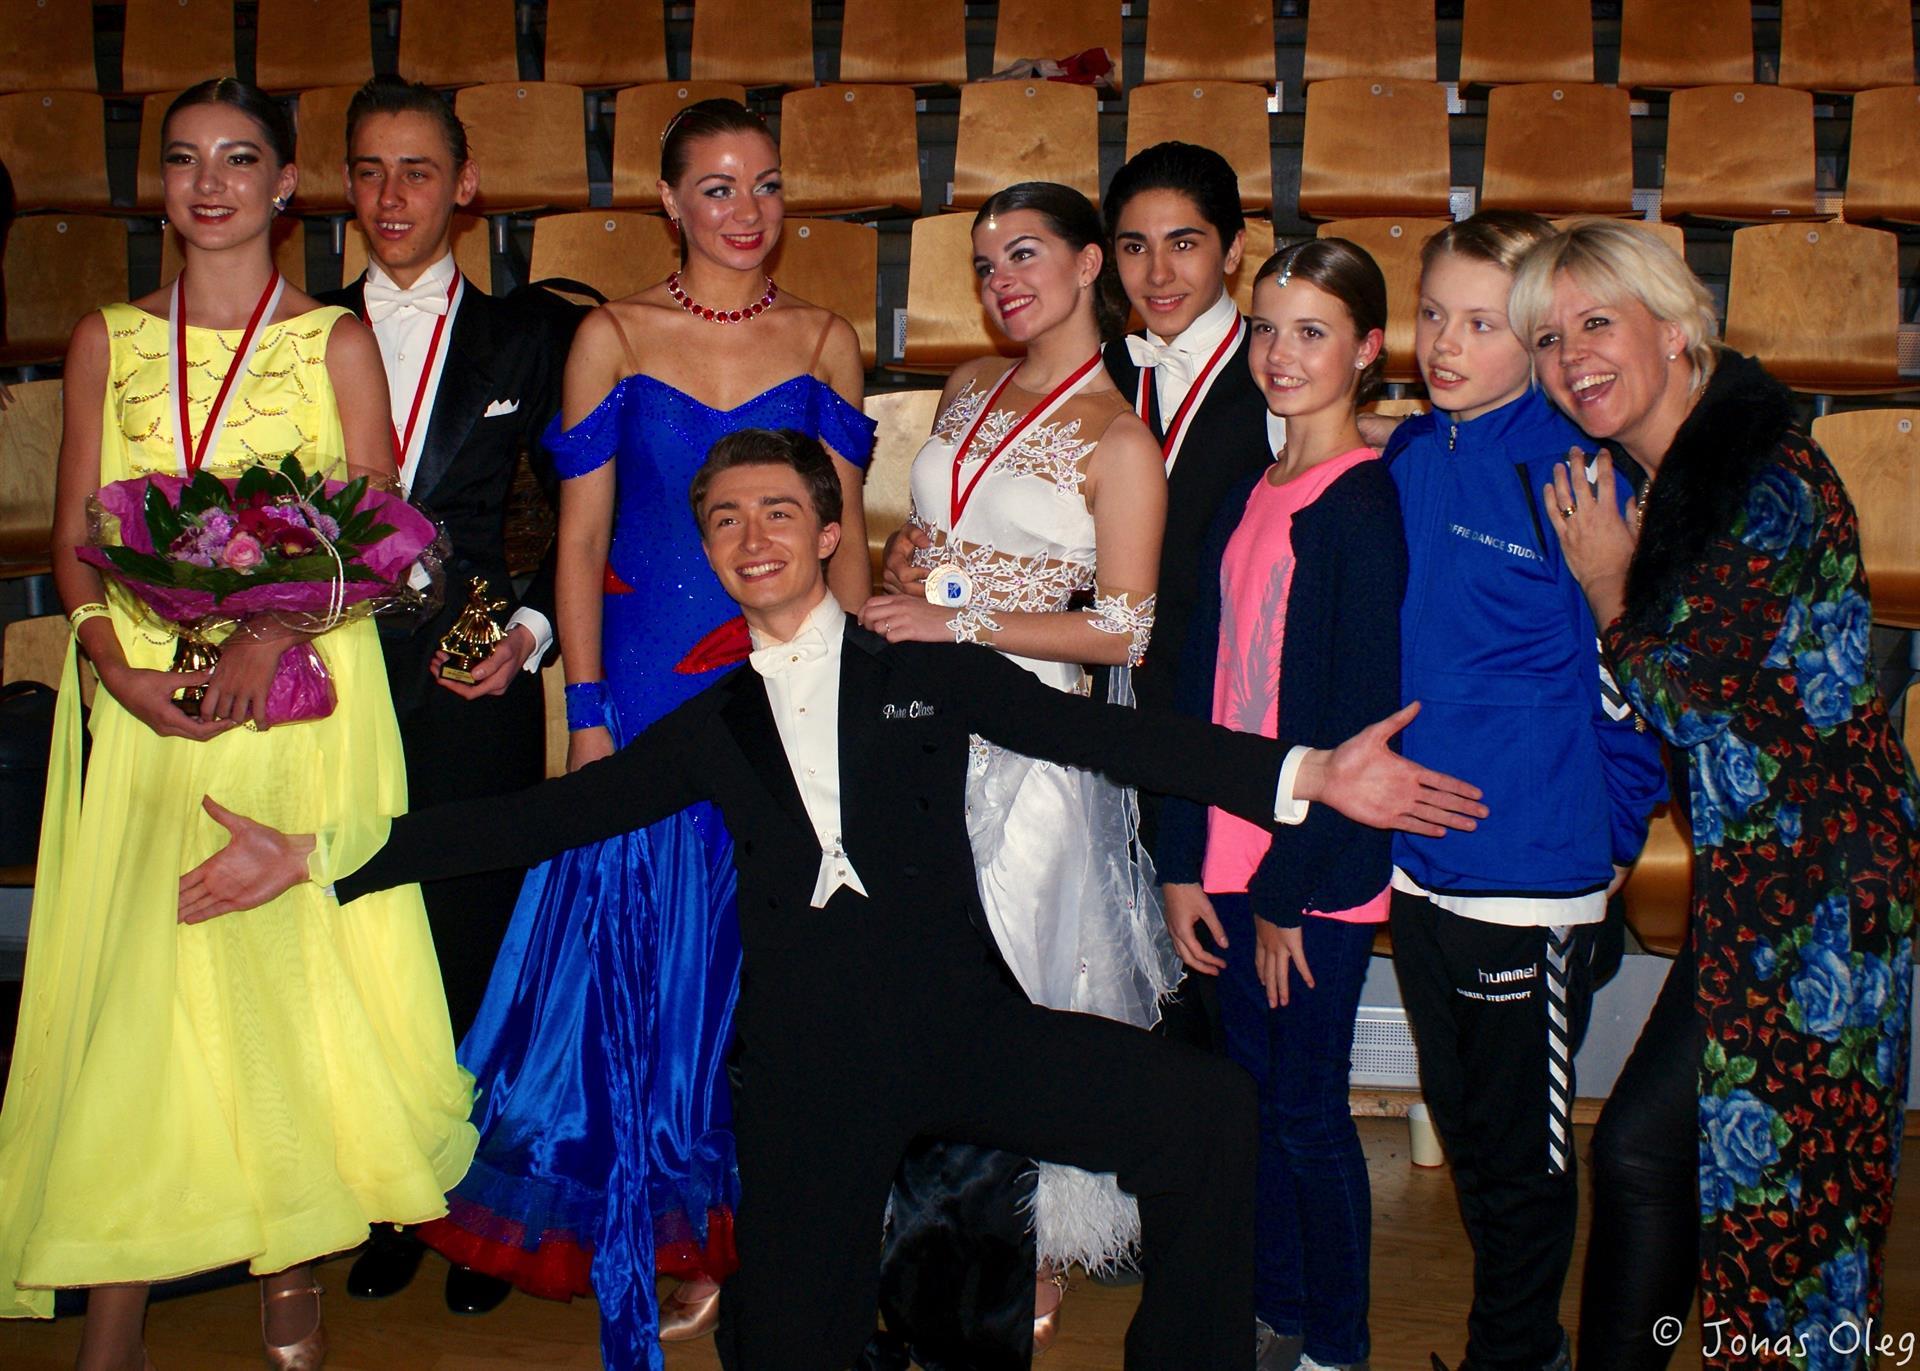 Alle Soffie Dance Studio's dejlige turneringsdansere